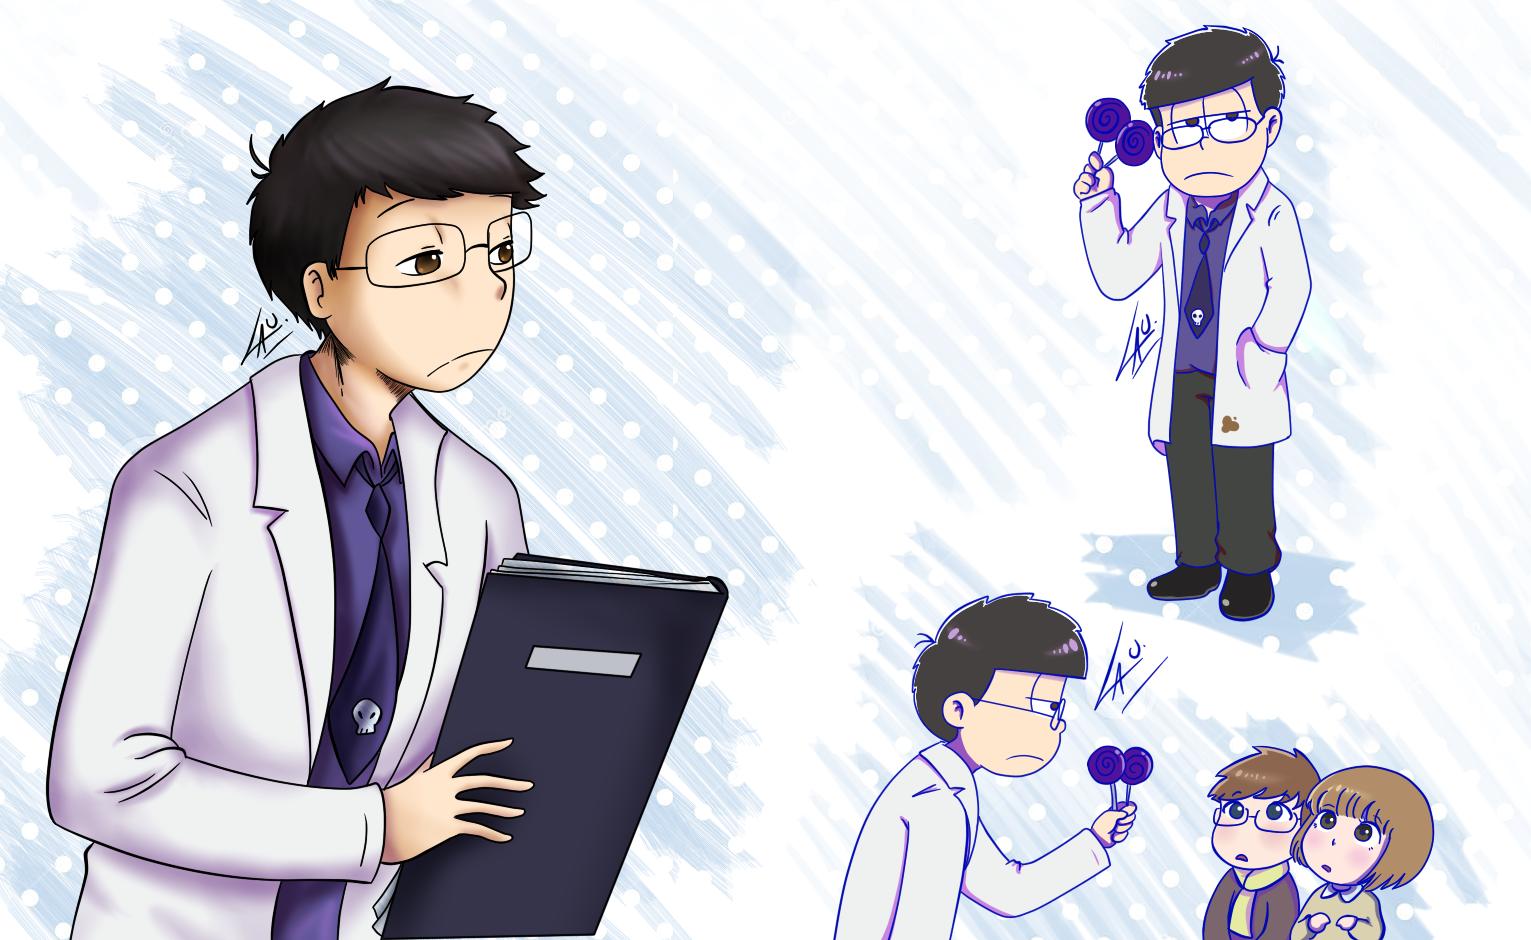 Doctor Ichimatsu by kuki4982